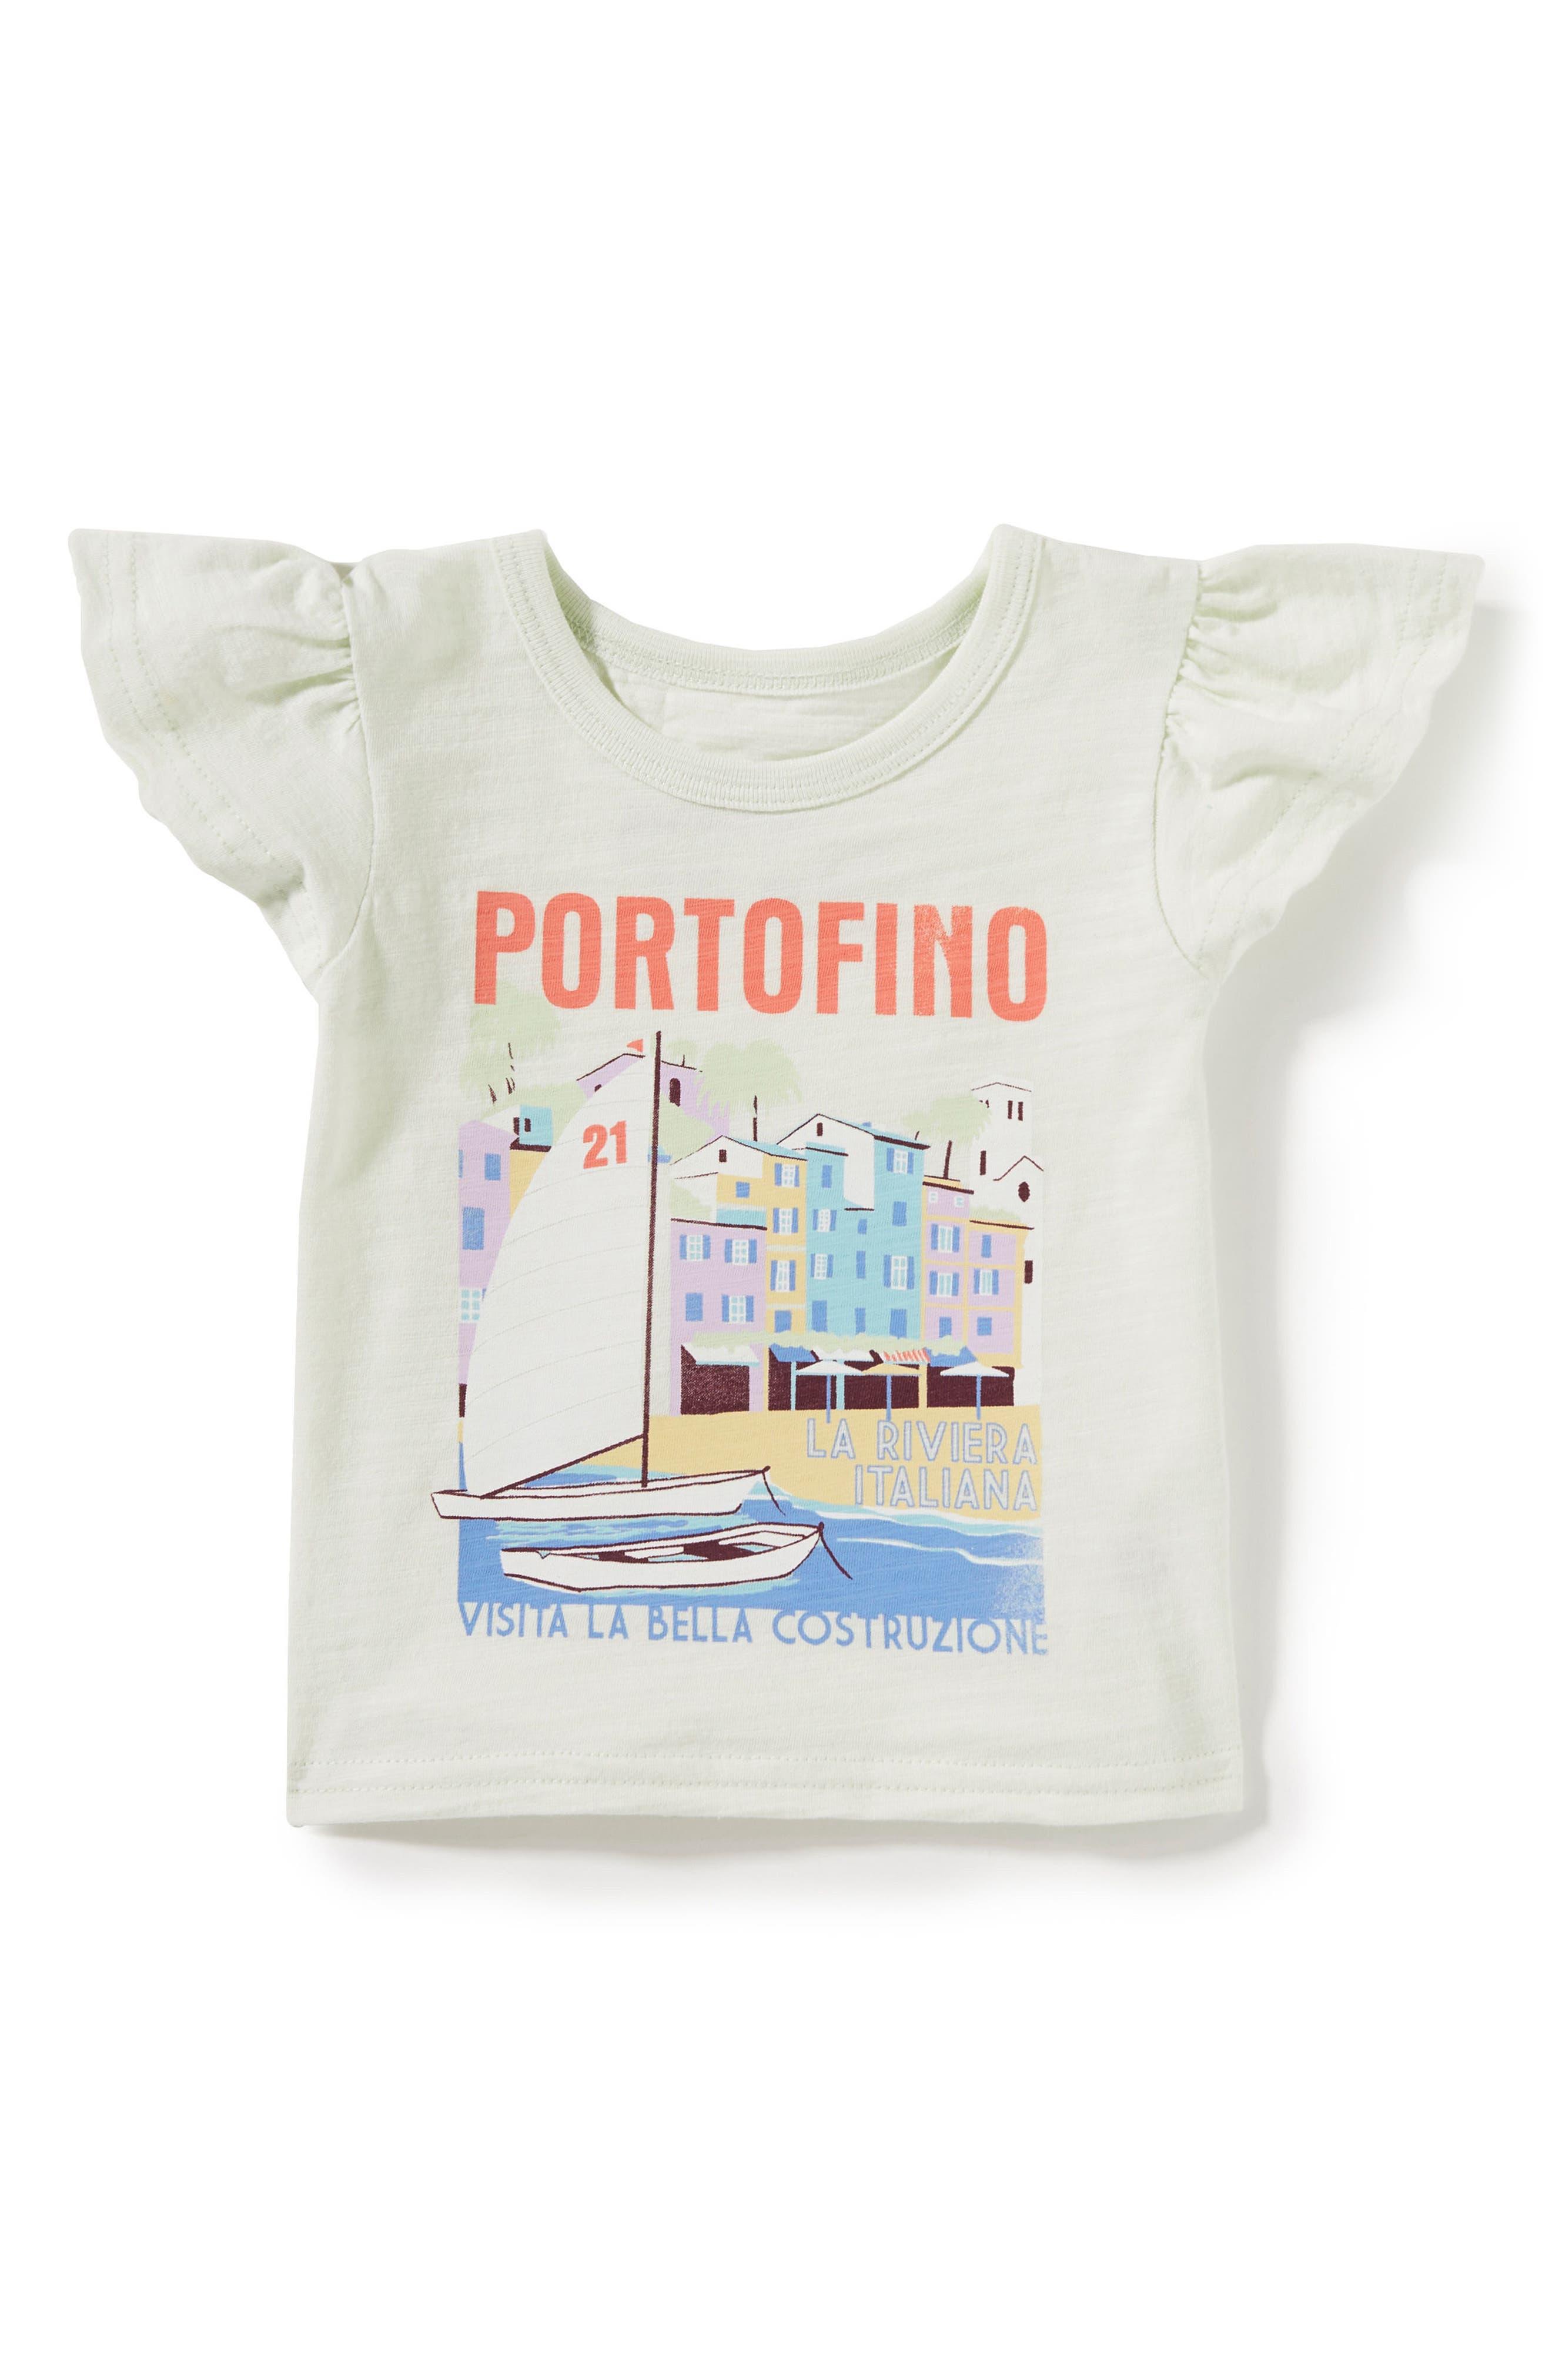 Portofino Ruffle Tee,                             Main thumbnail 1, color,                             337